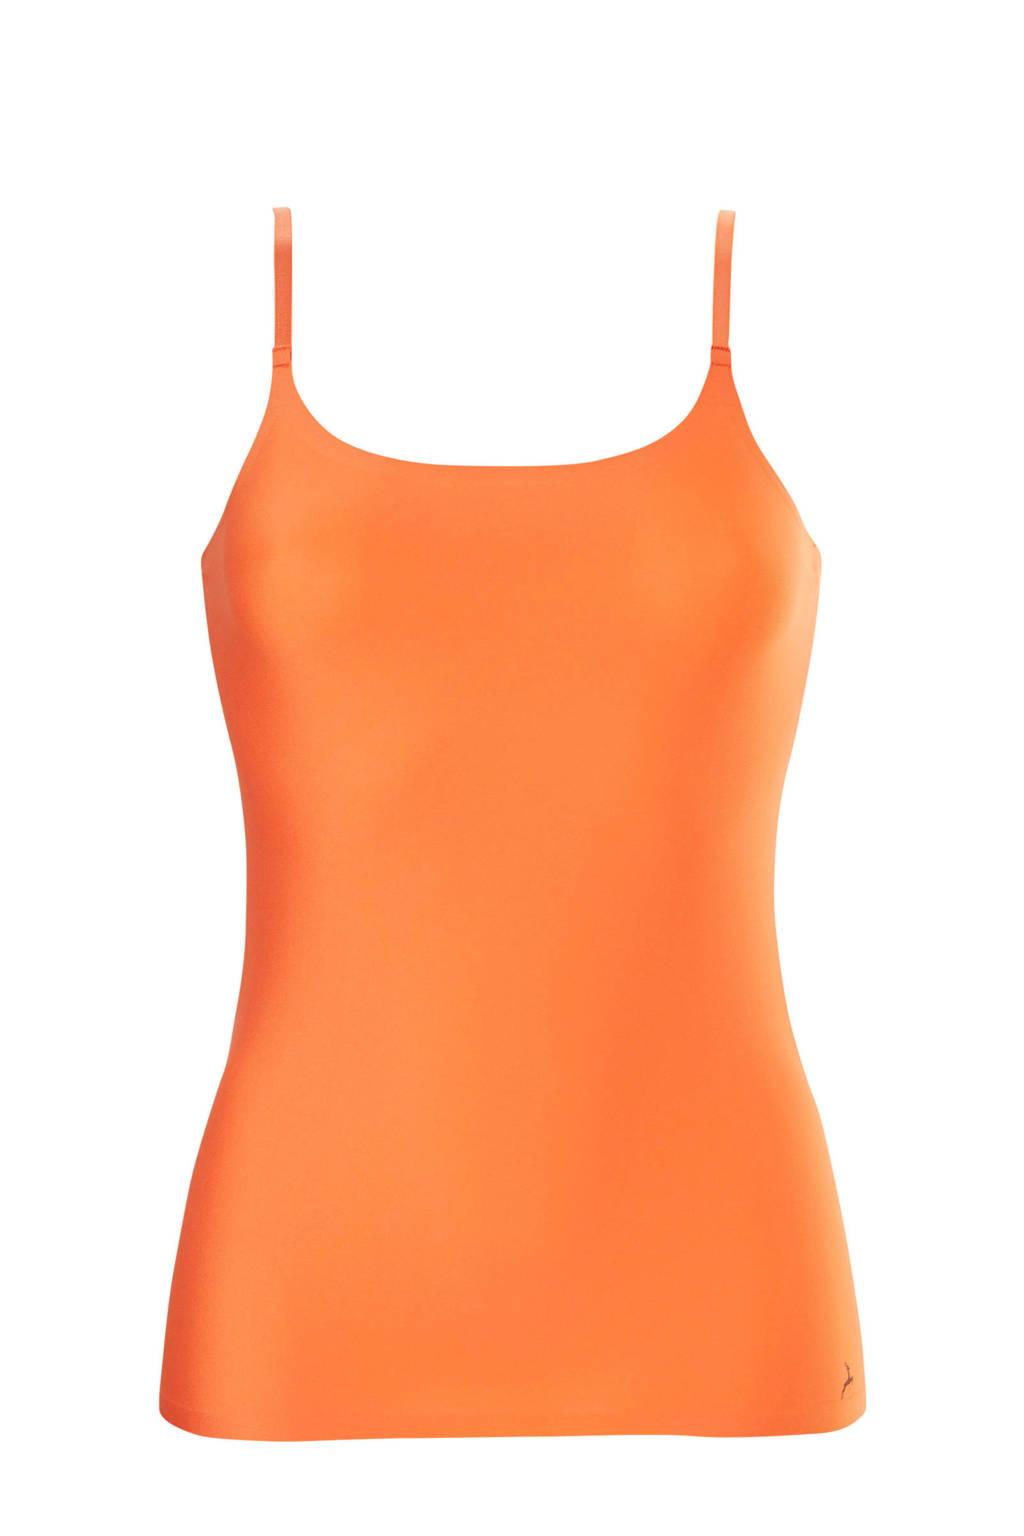 ten Cate Secrets hemd oranje, Oranje